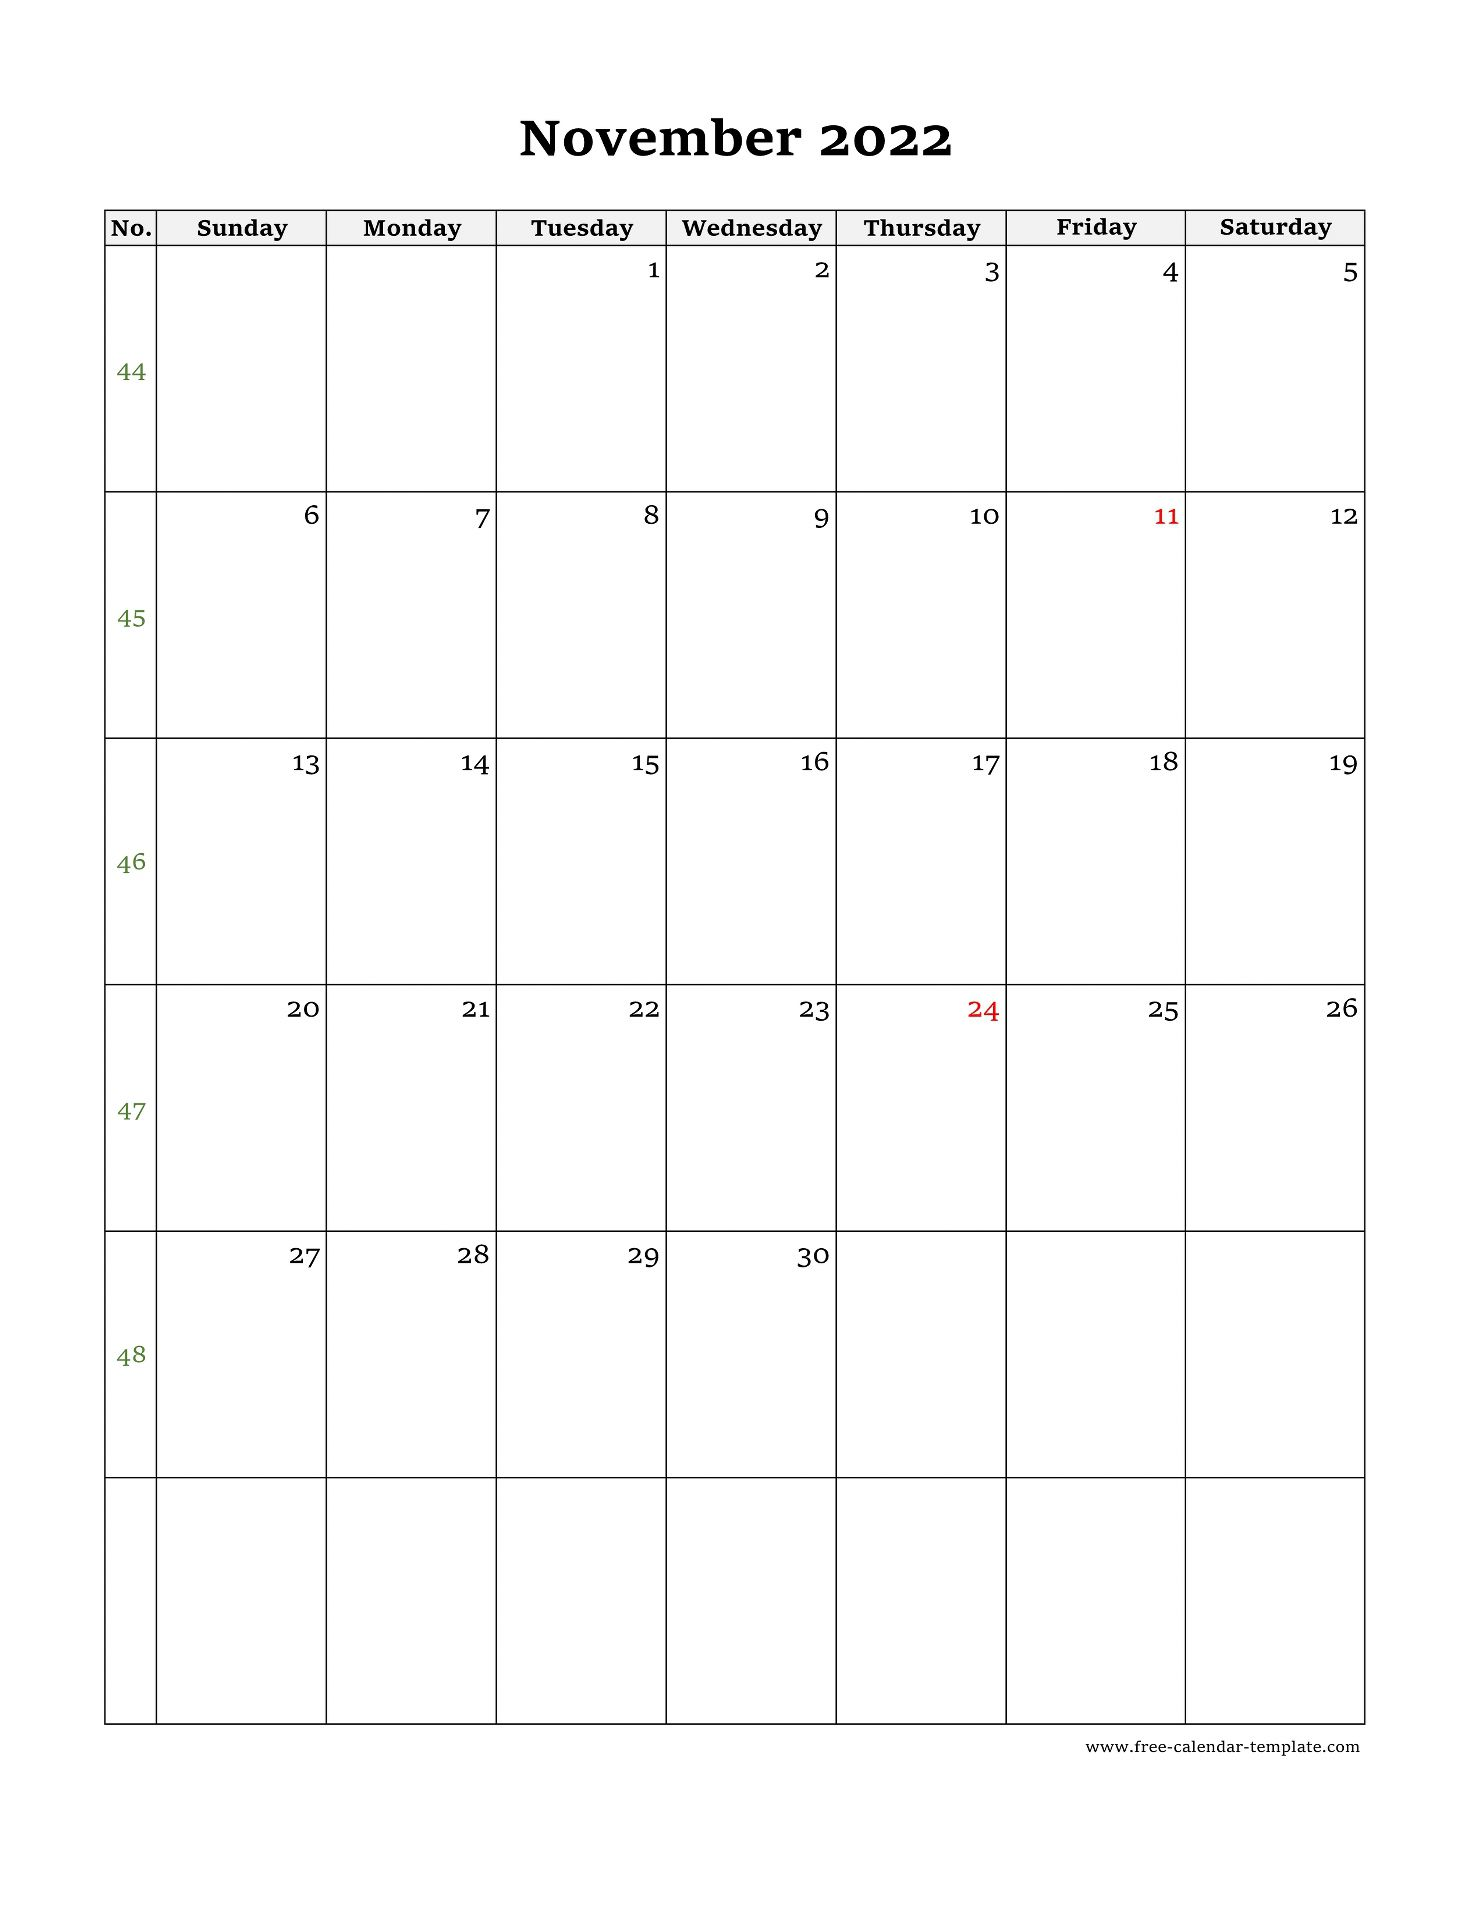 Calendar 2022 November.November Calendar 2022 Simple Design With Large Box On Each Day For Notes Free Calendar Template Com